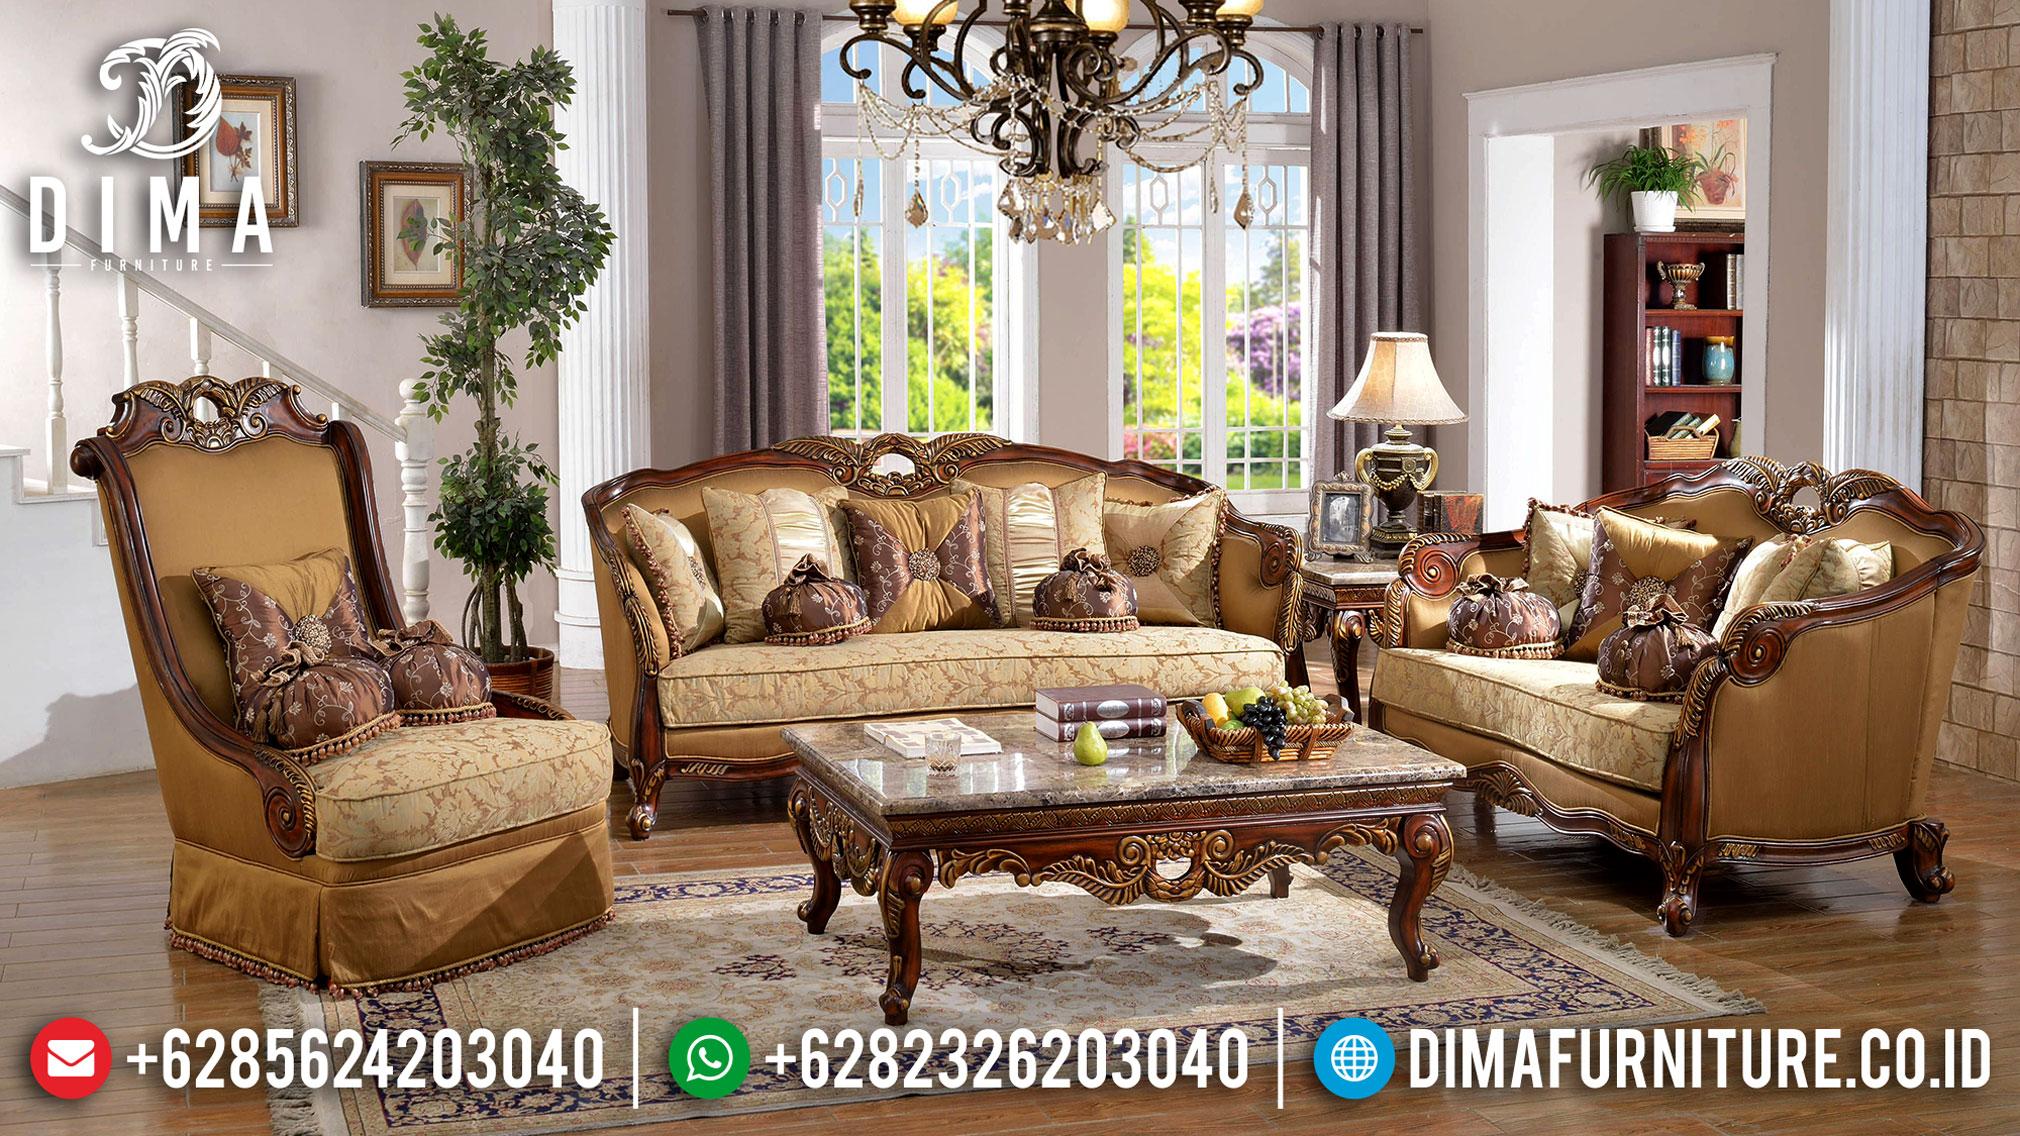 Luxury Classic Set Sofa Tamu Mewah Gaya Empire Louise XI BT-0858